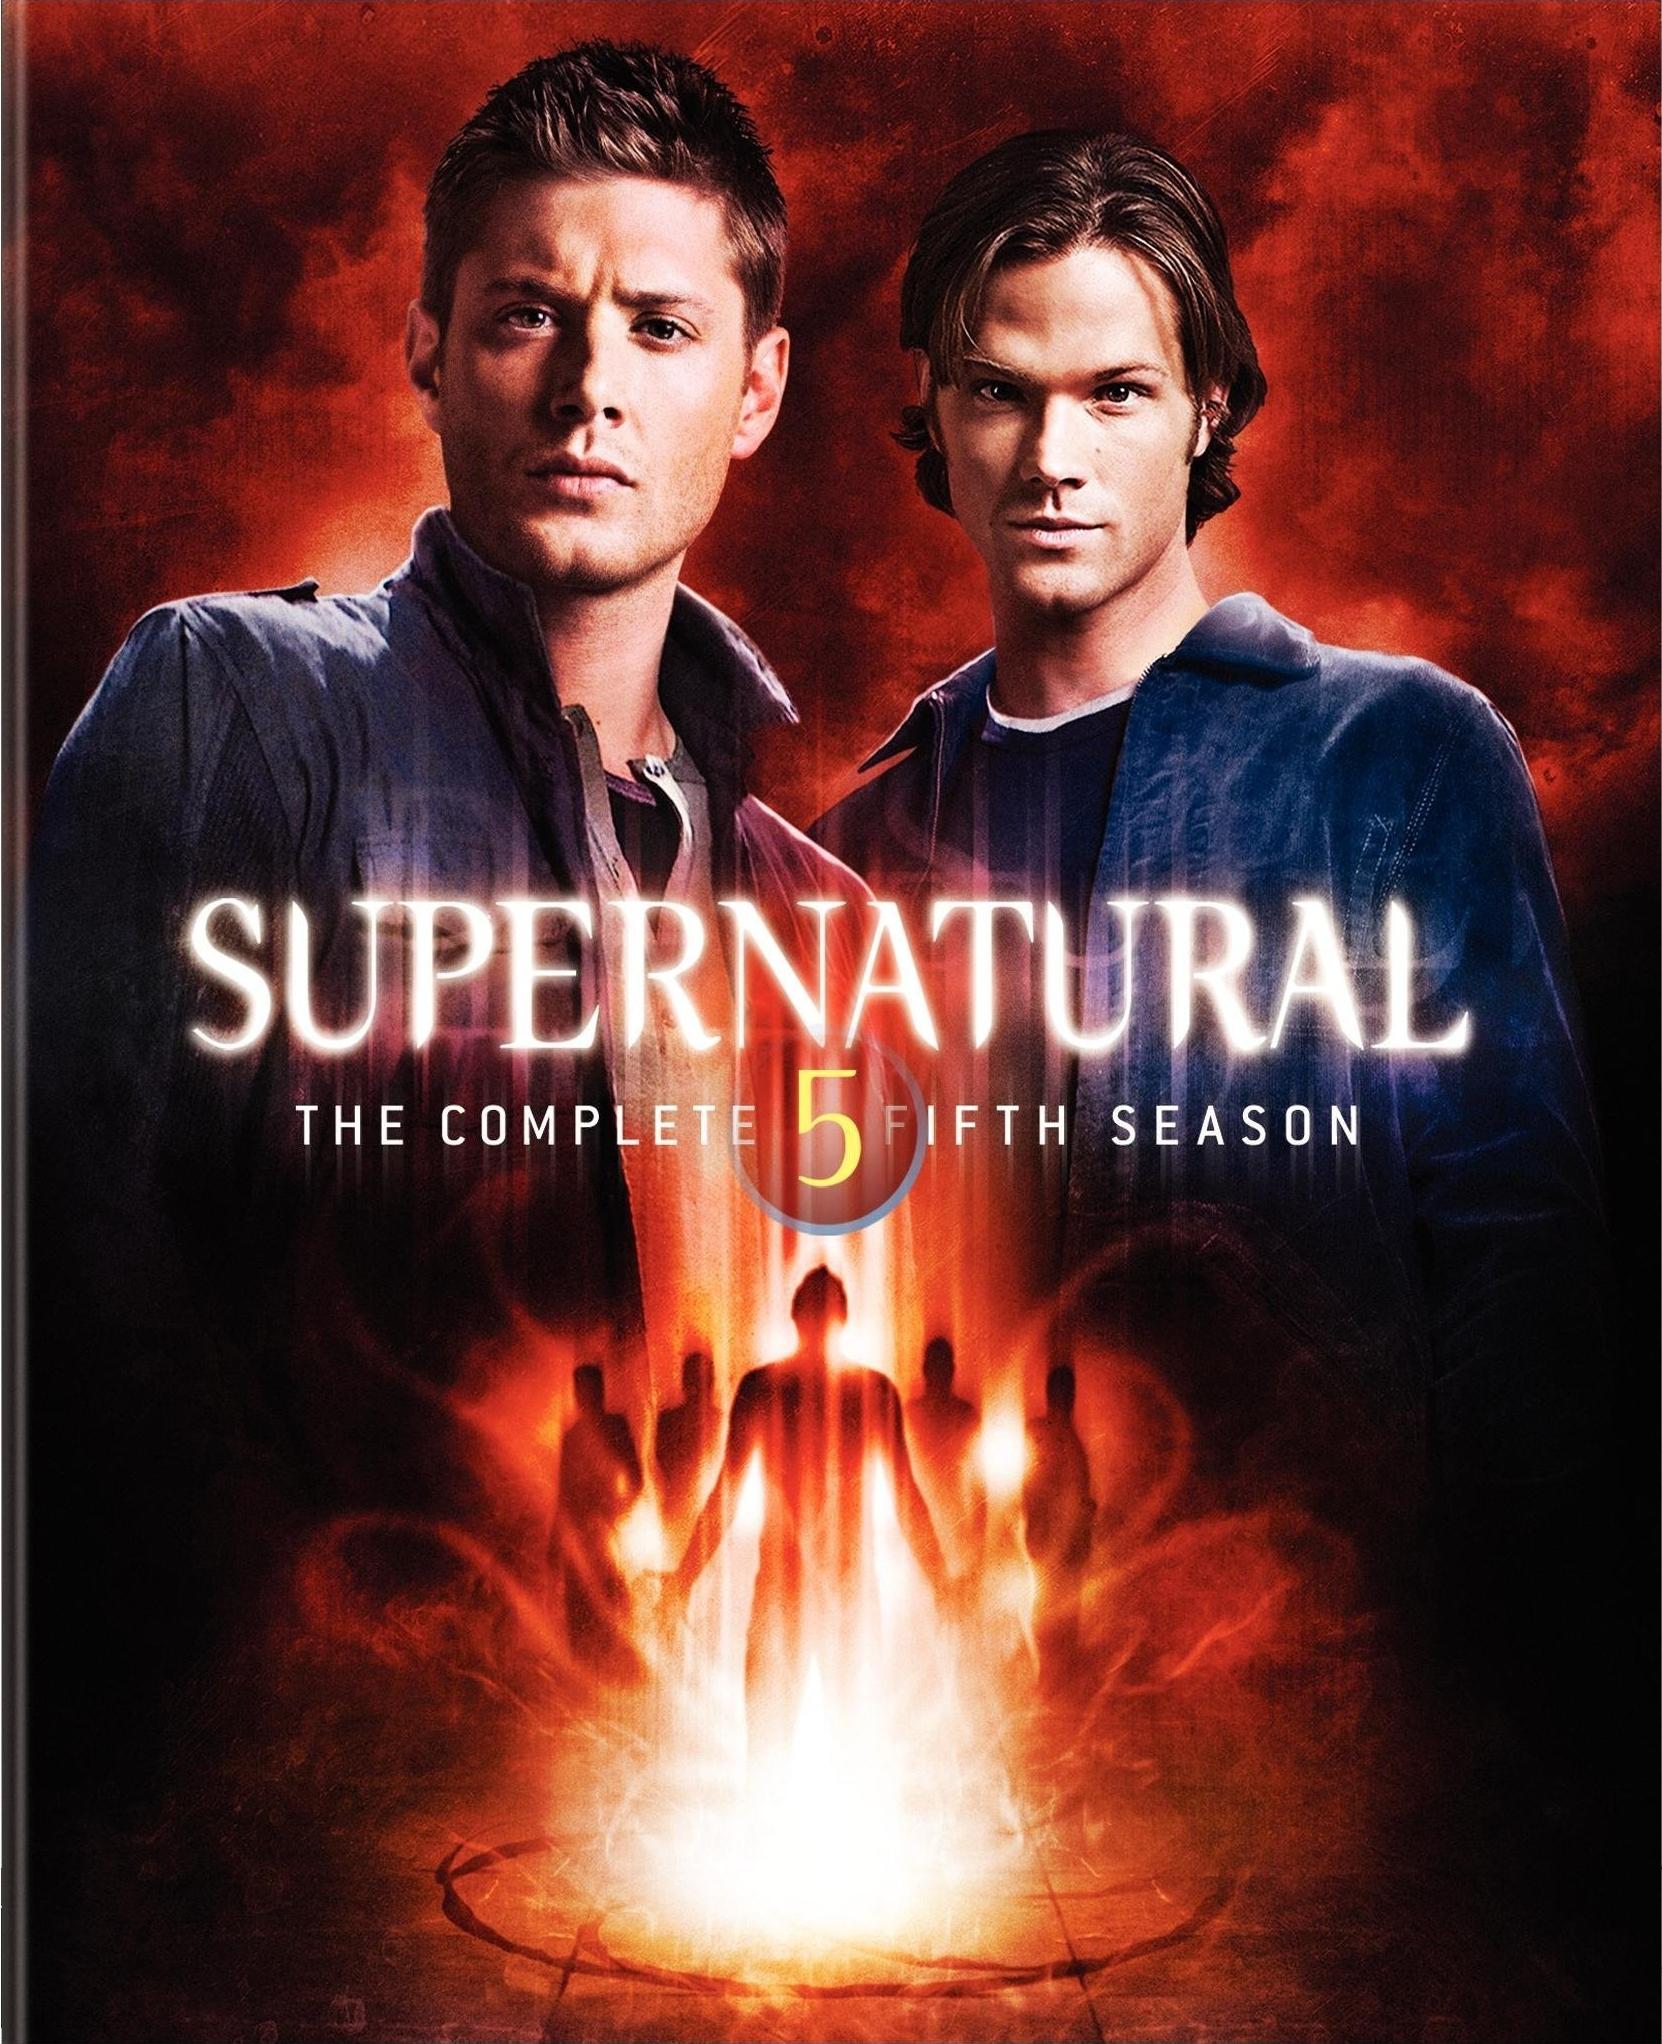 Supernatural Season 5 BRCover.jpg